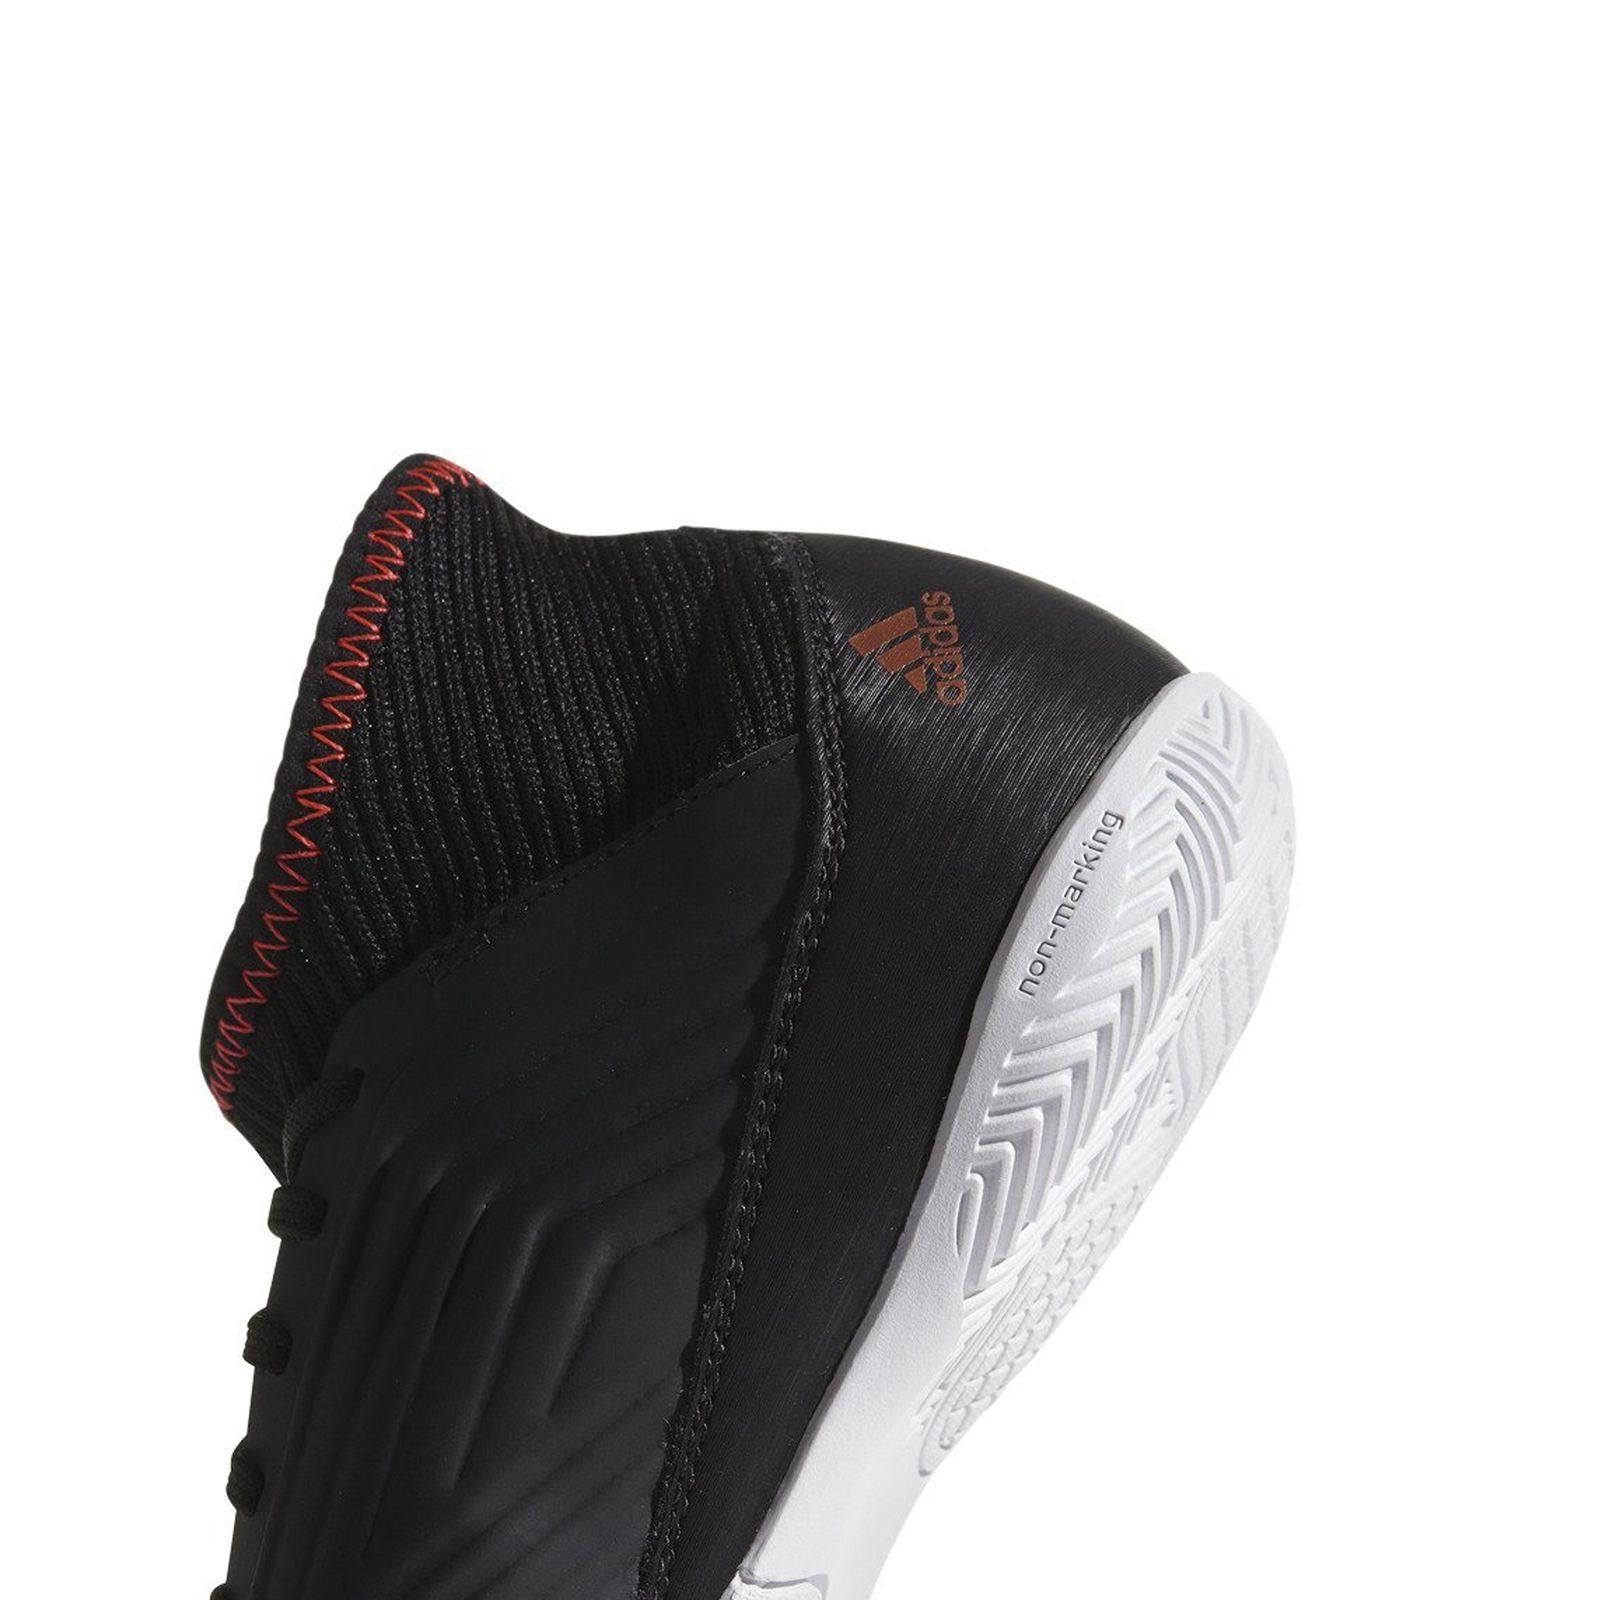 کفش مخصوص فوتسال پسرانه آدیداس سری Predator مدل CP9076 main 1 5